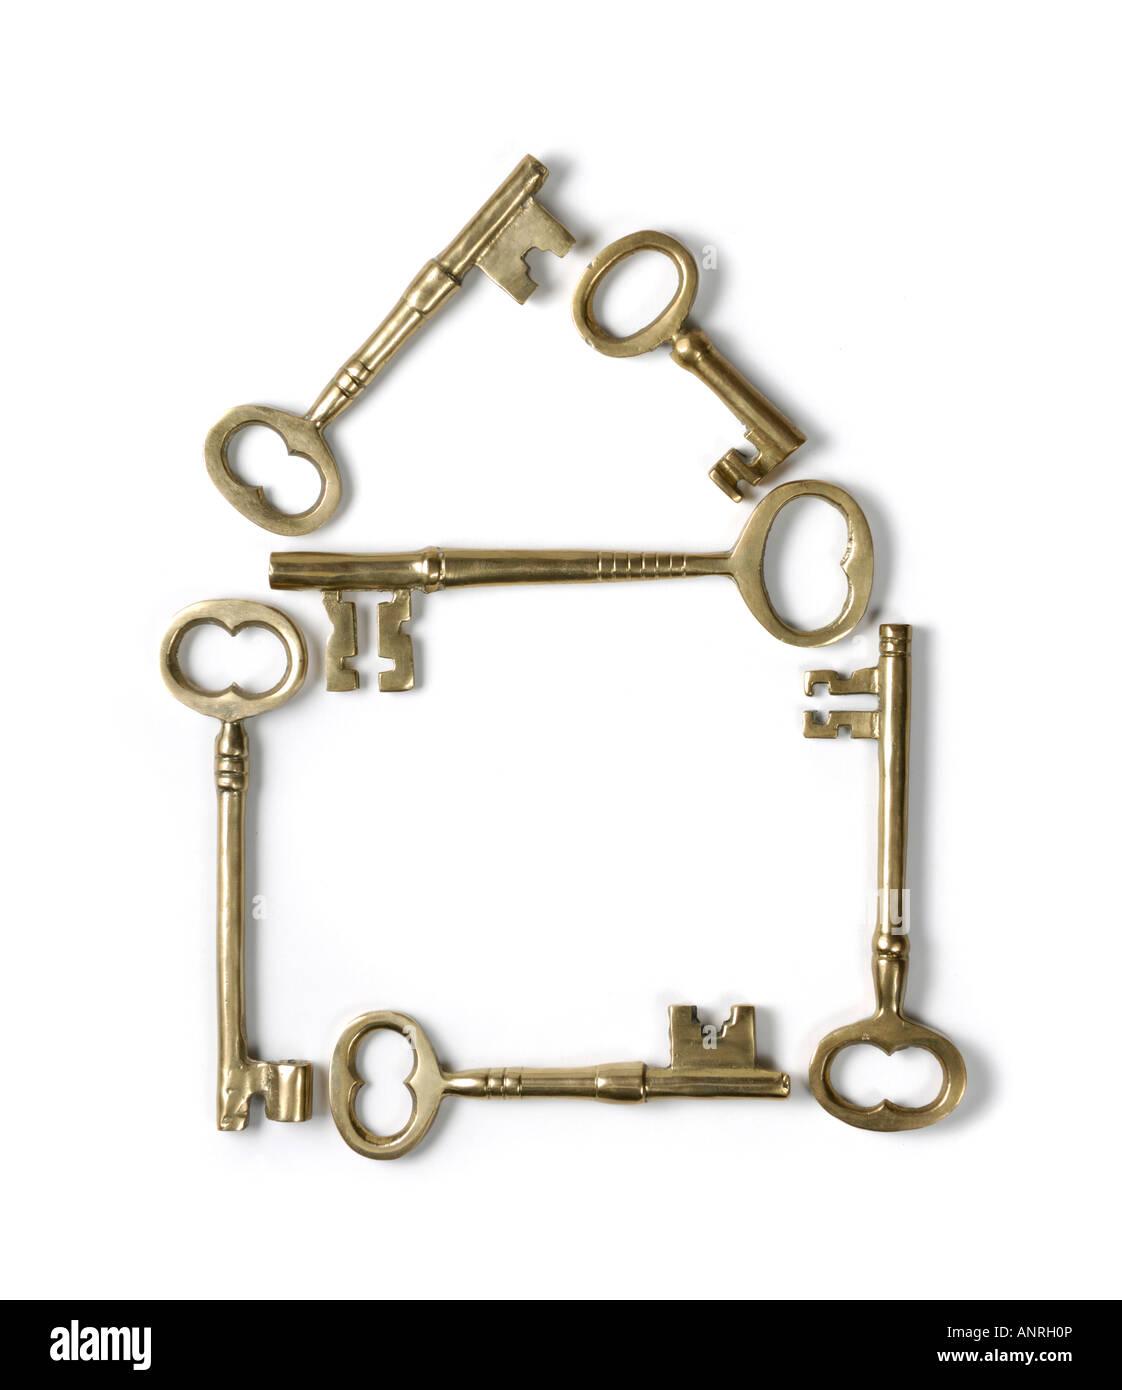 Home-Symbol hergestellt aus glänzendem Messing Skelett Schlüssel Stockbild